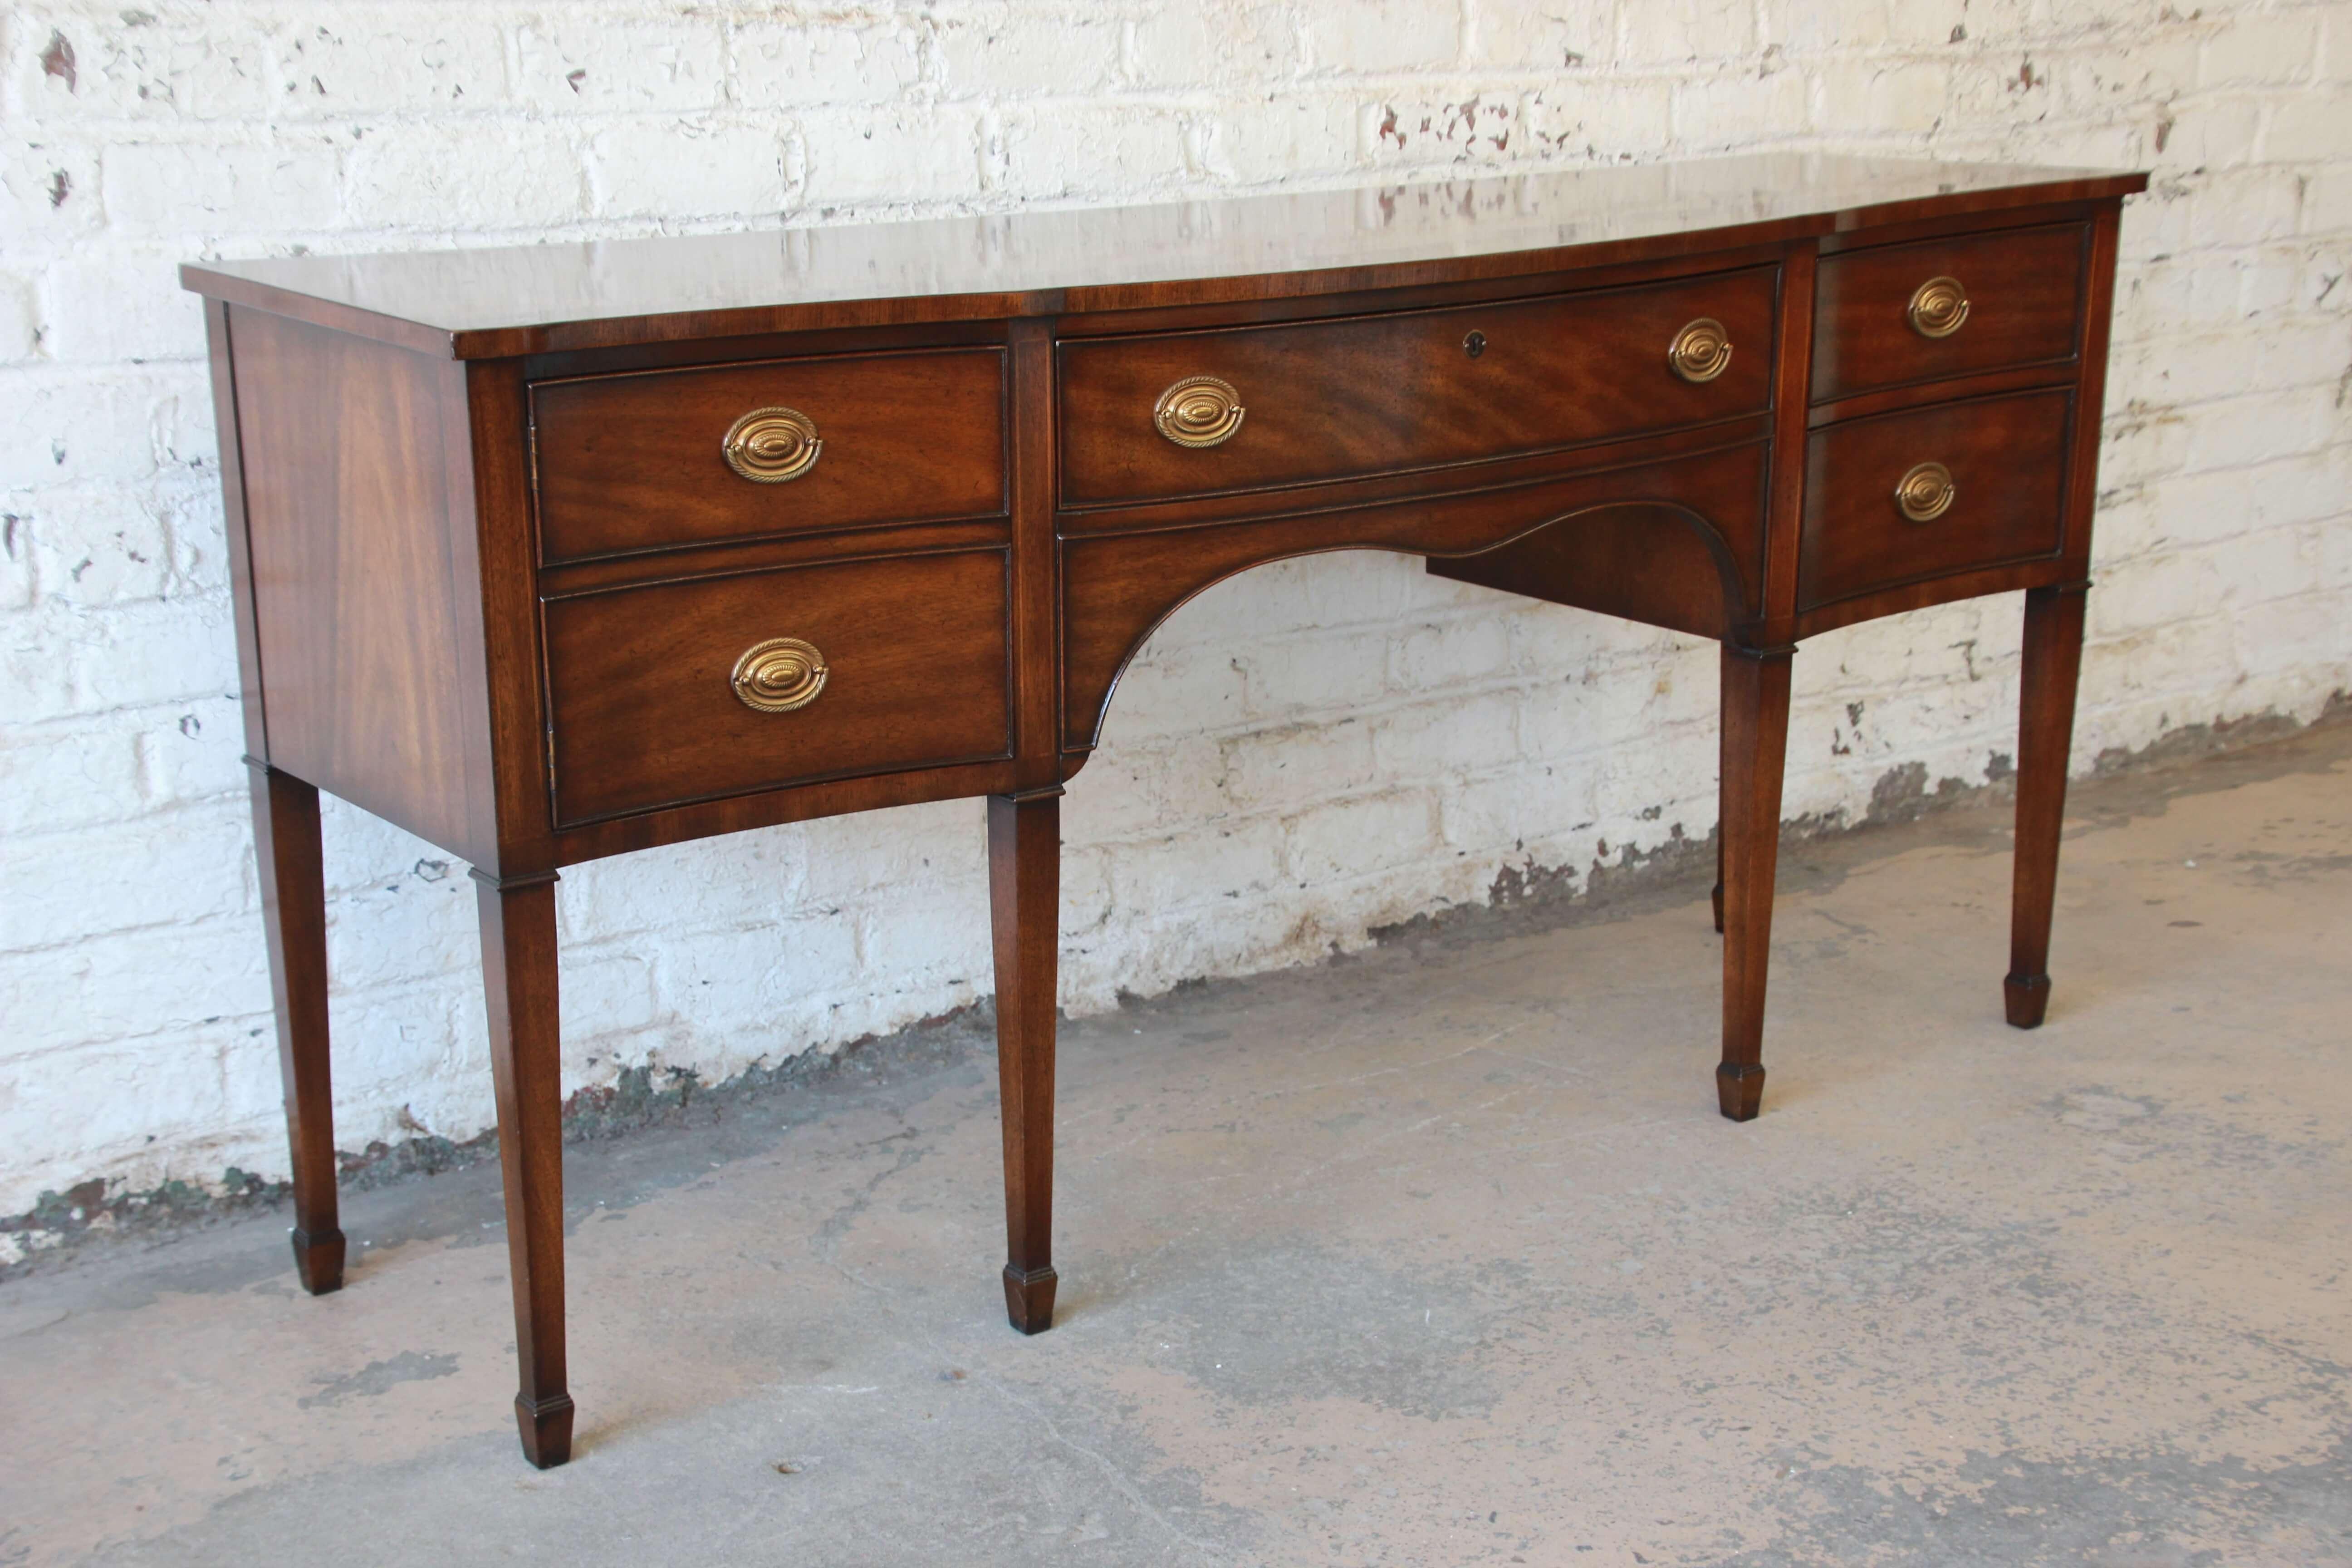 Federal Kindel Furniture Windermere Hepplewhite Style Mahogany Sideboard  Credenza For Sale